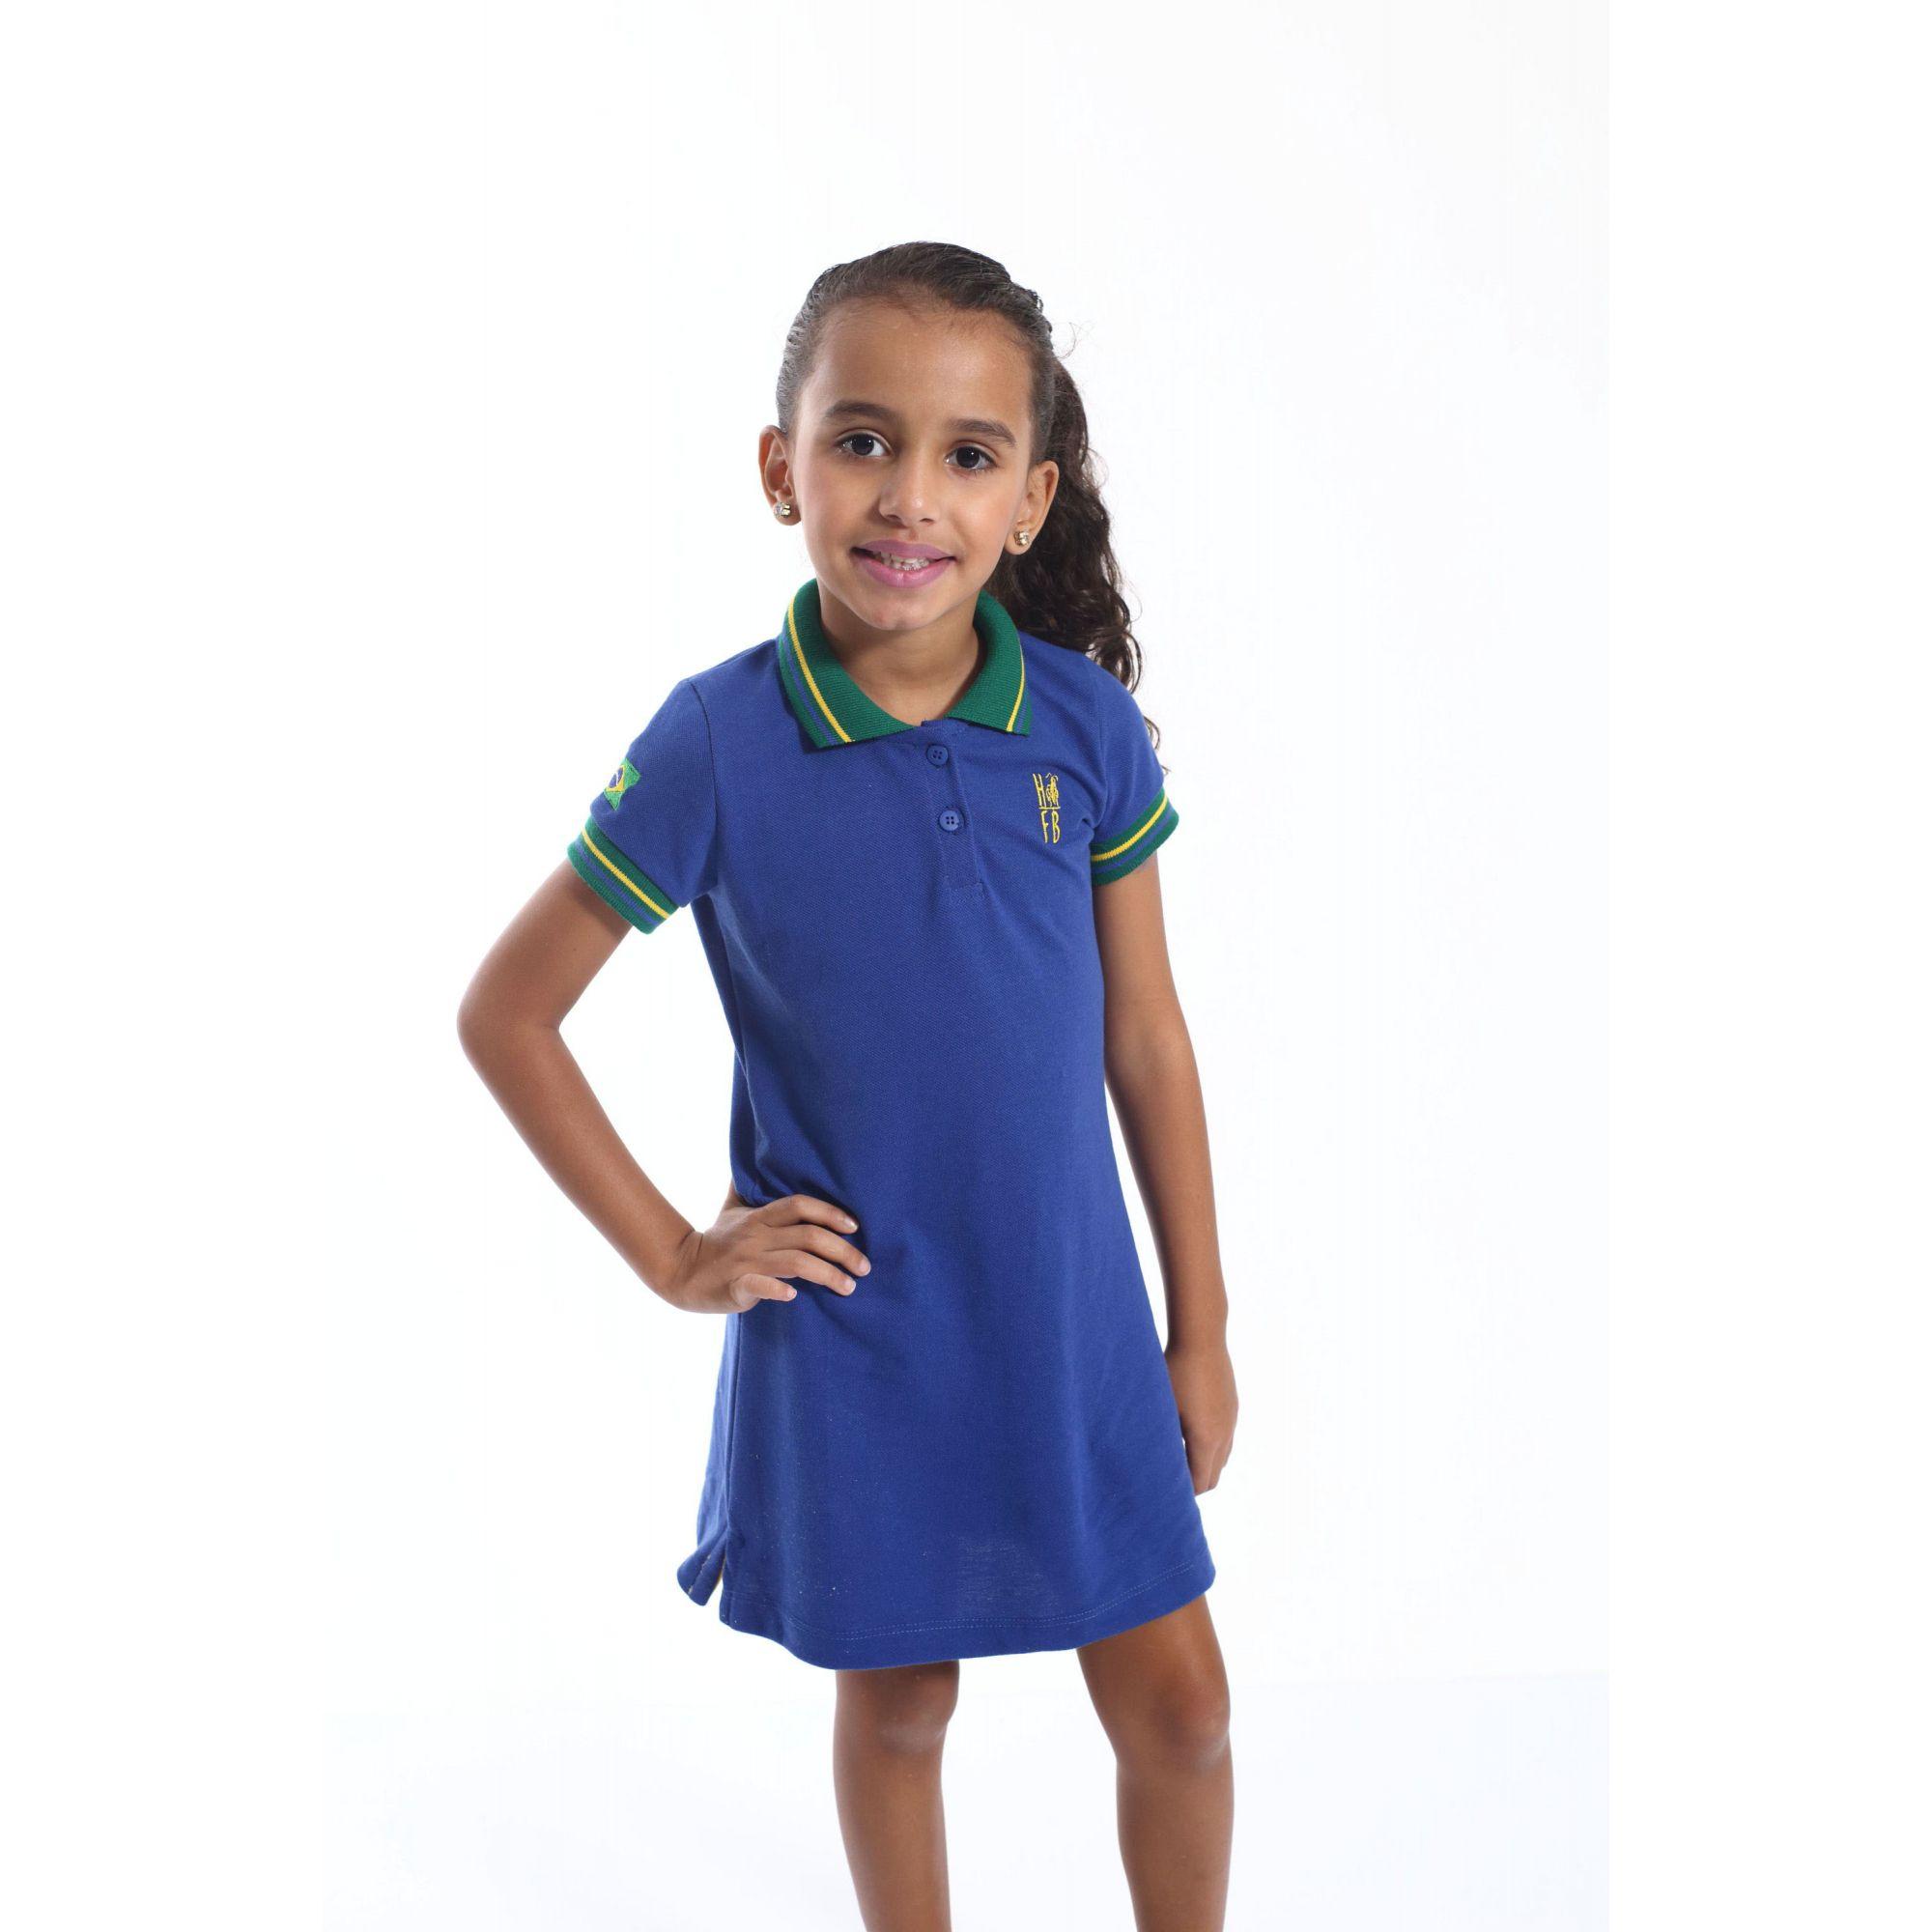 Vestido Polo Infantil Azul Royal  - Heitor Fashion Brazil